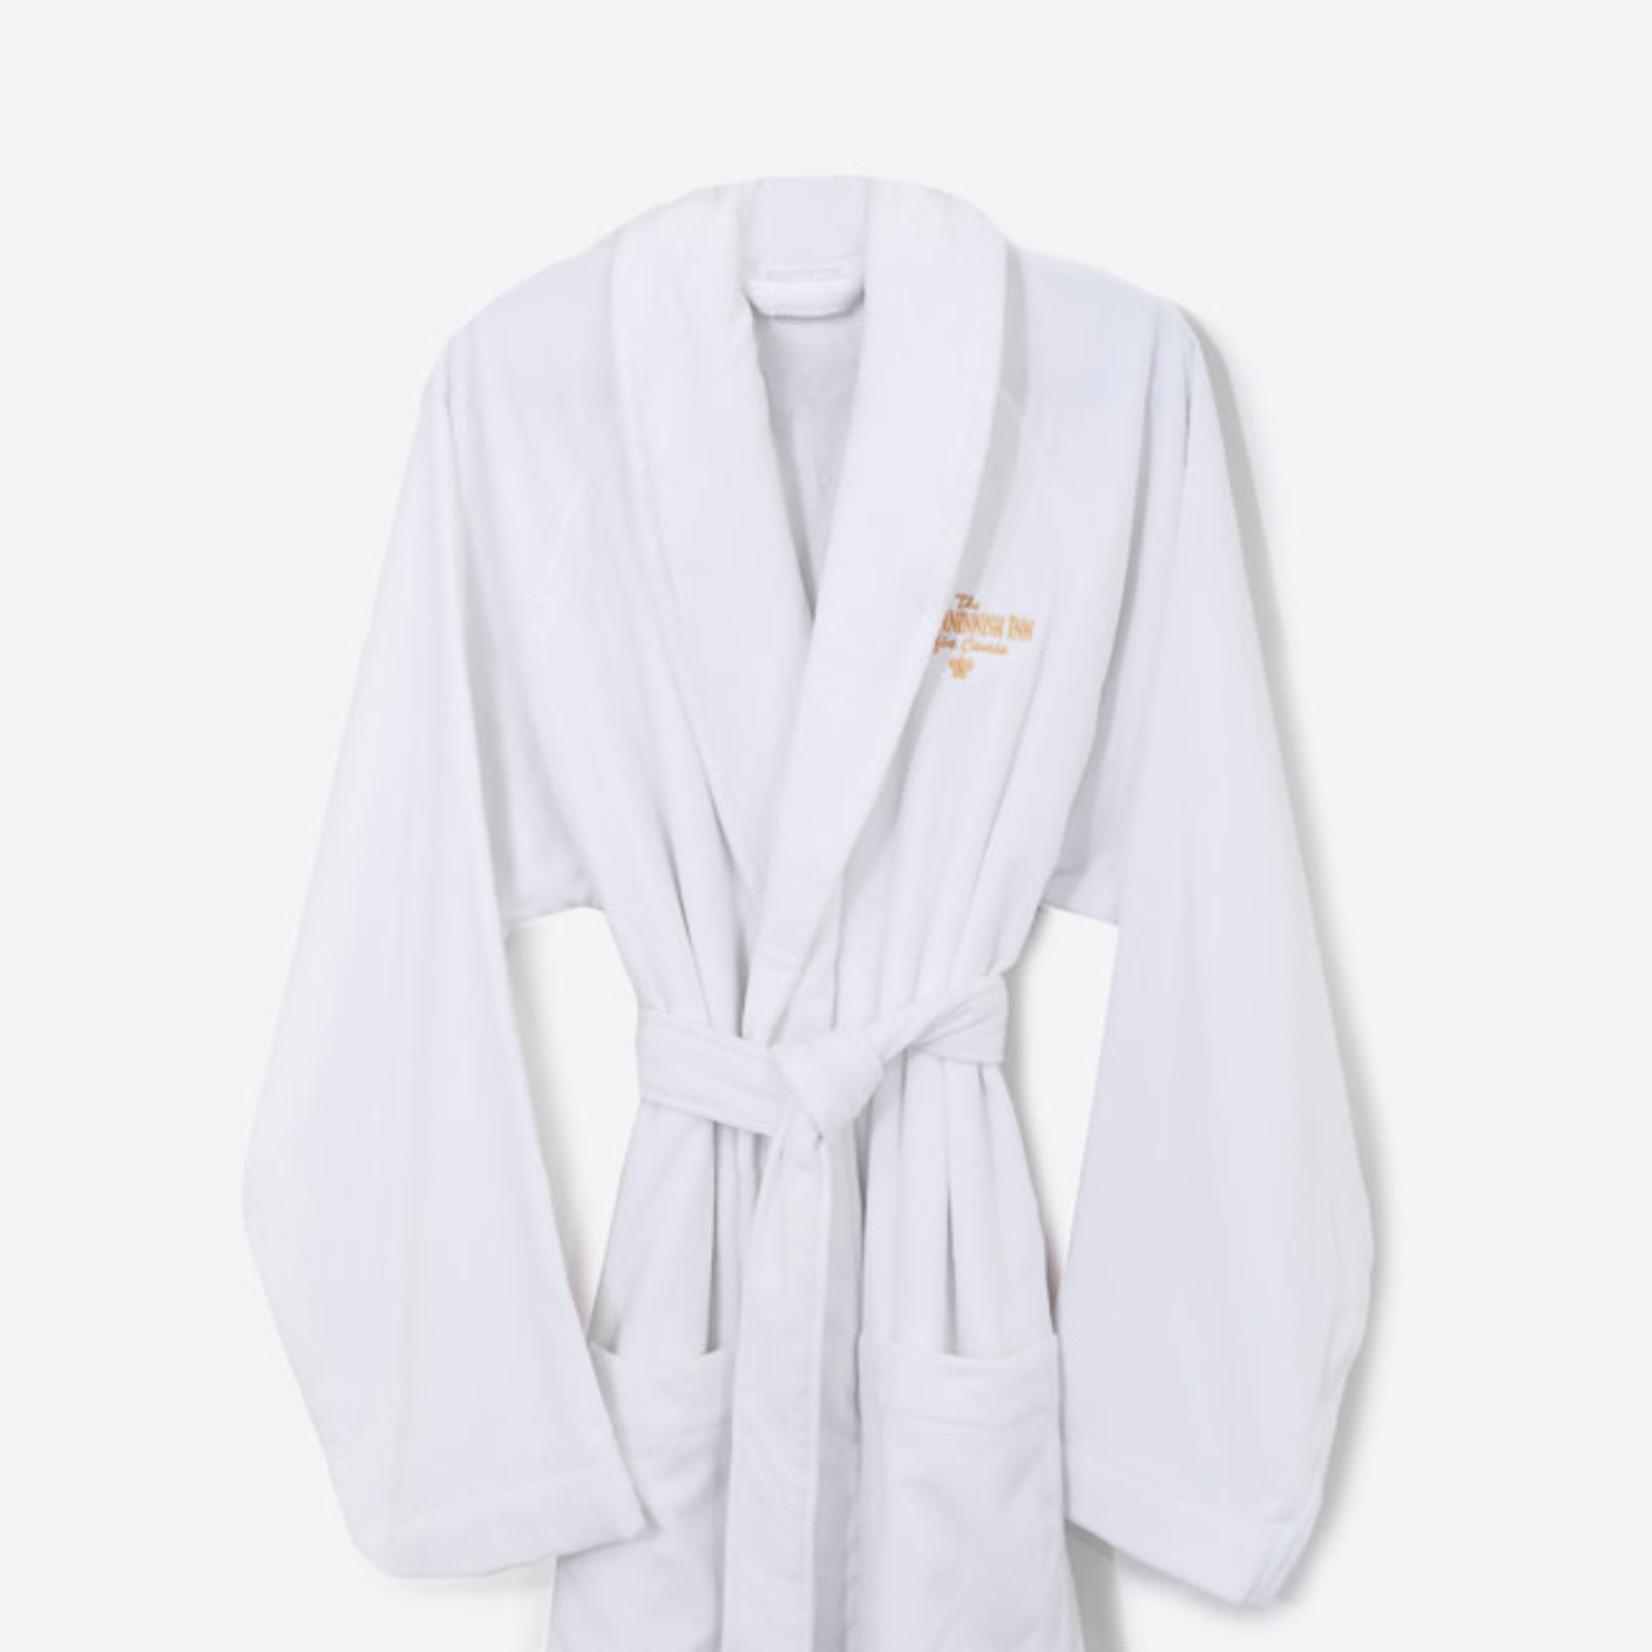 Frette Adult Robe (XL)